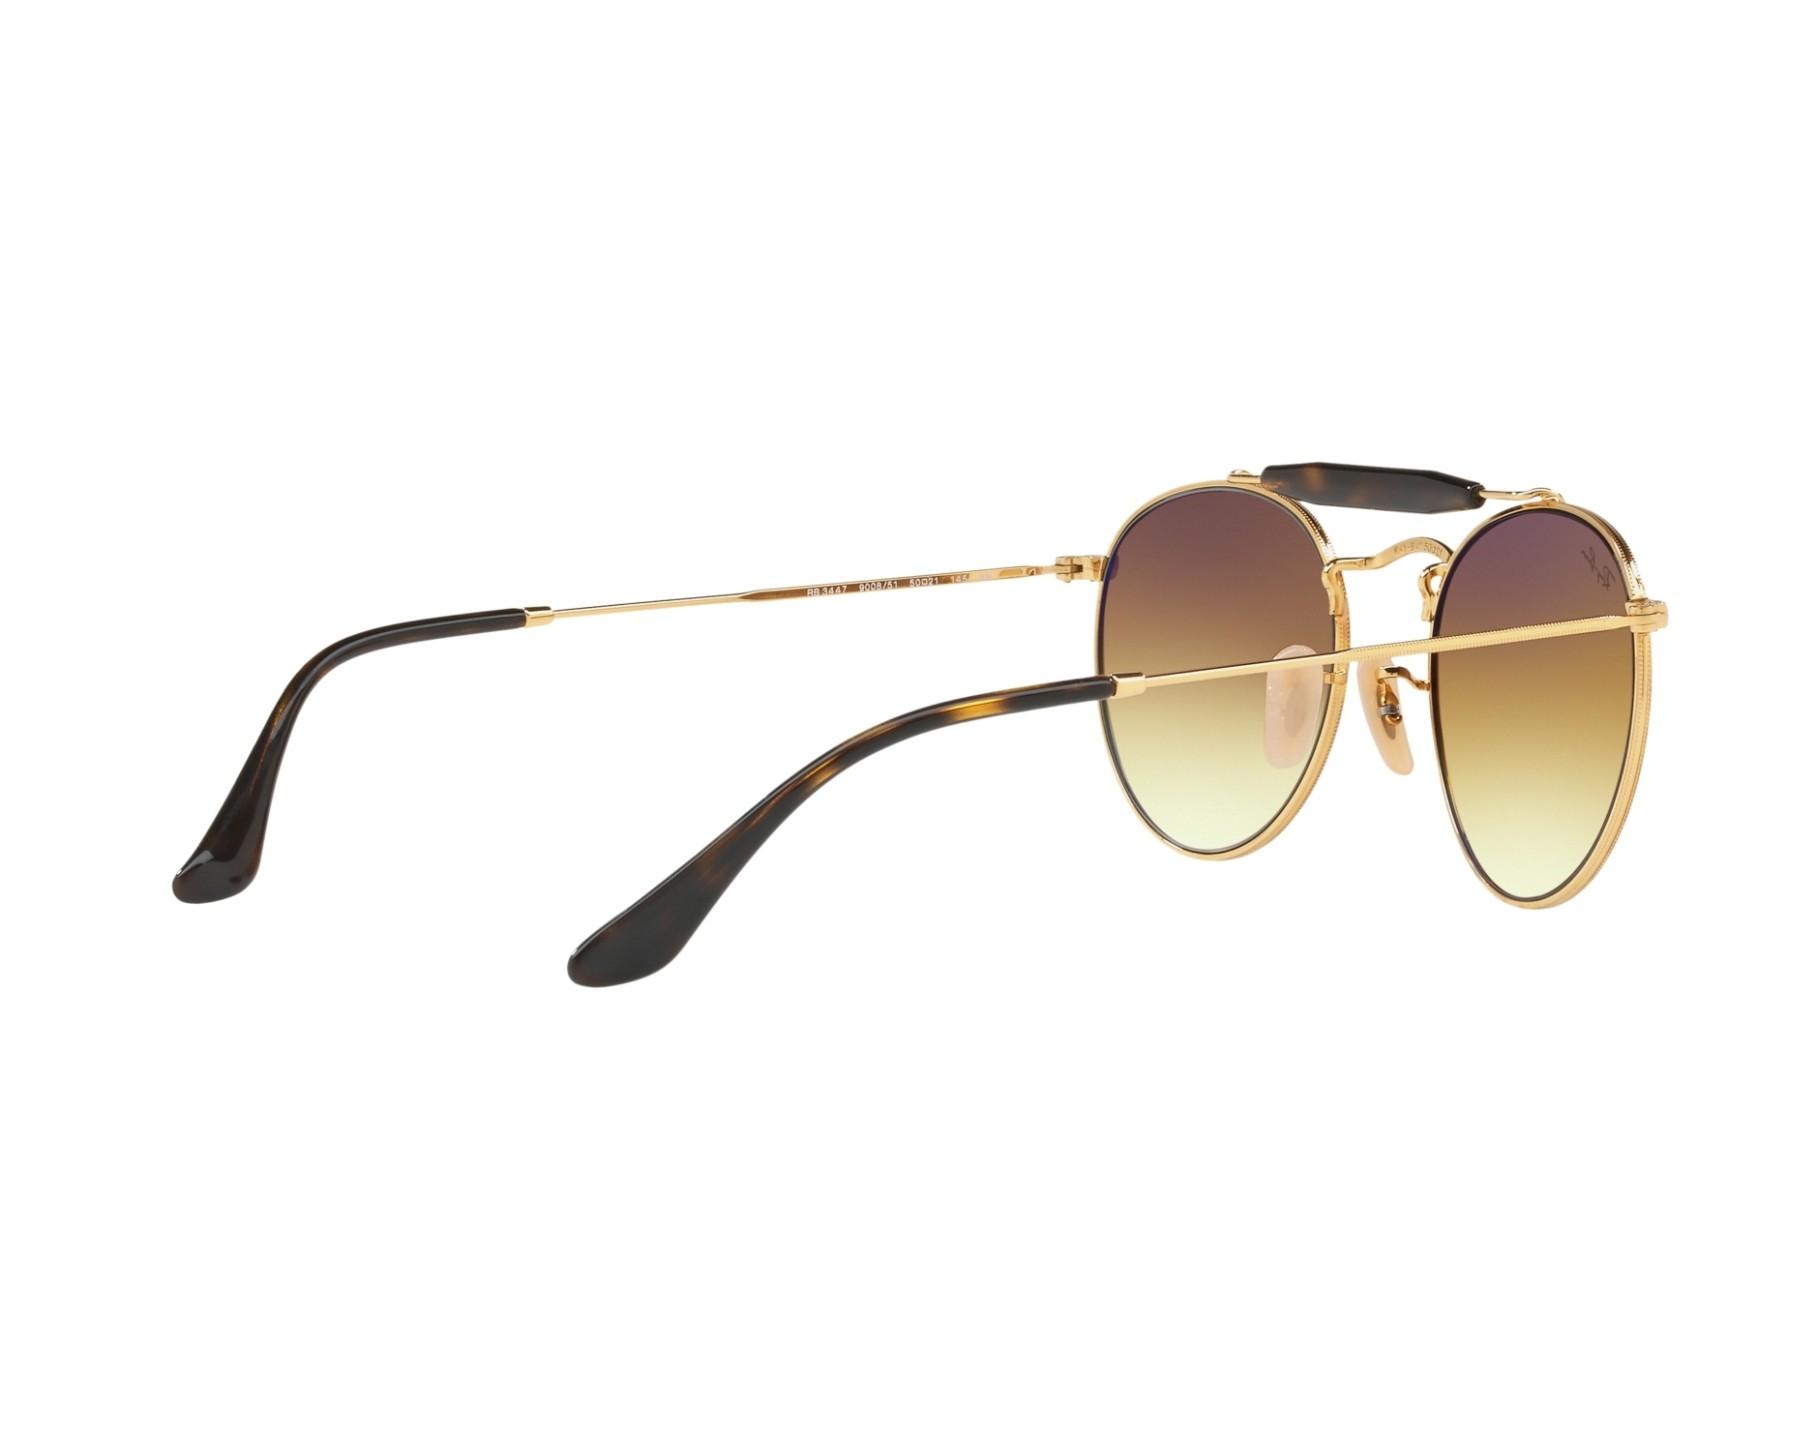 Ray-Ban RB3747 Sonnenbrille Gold / Braun 900851 50mm ZkpKf4d